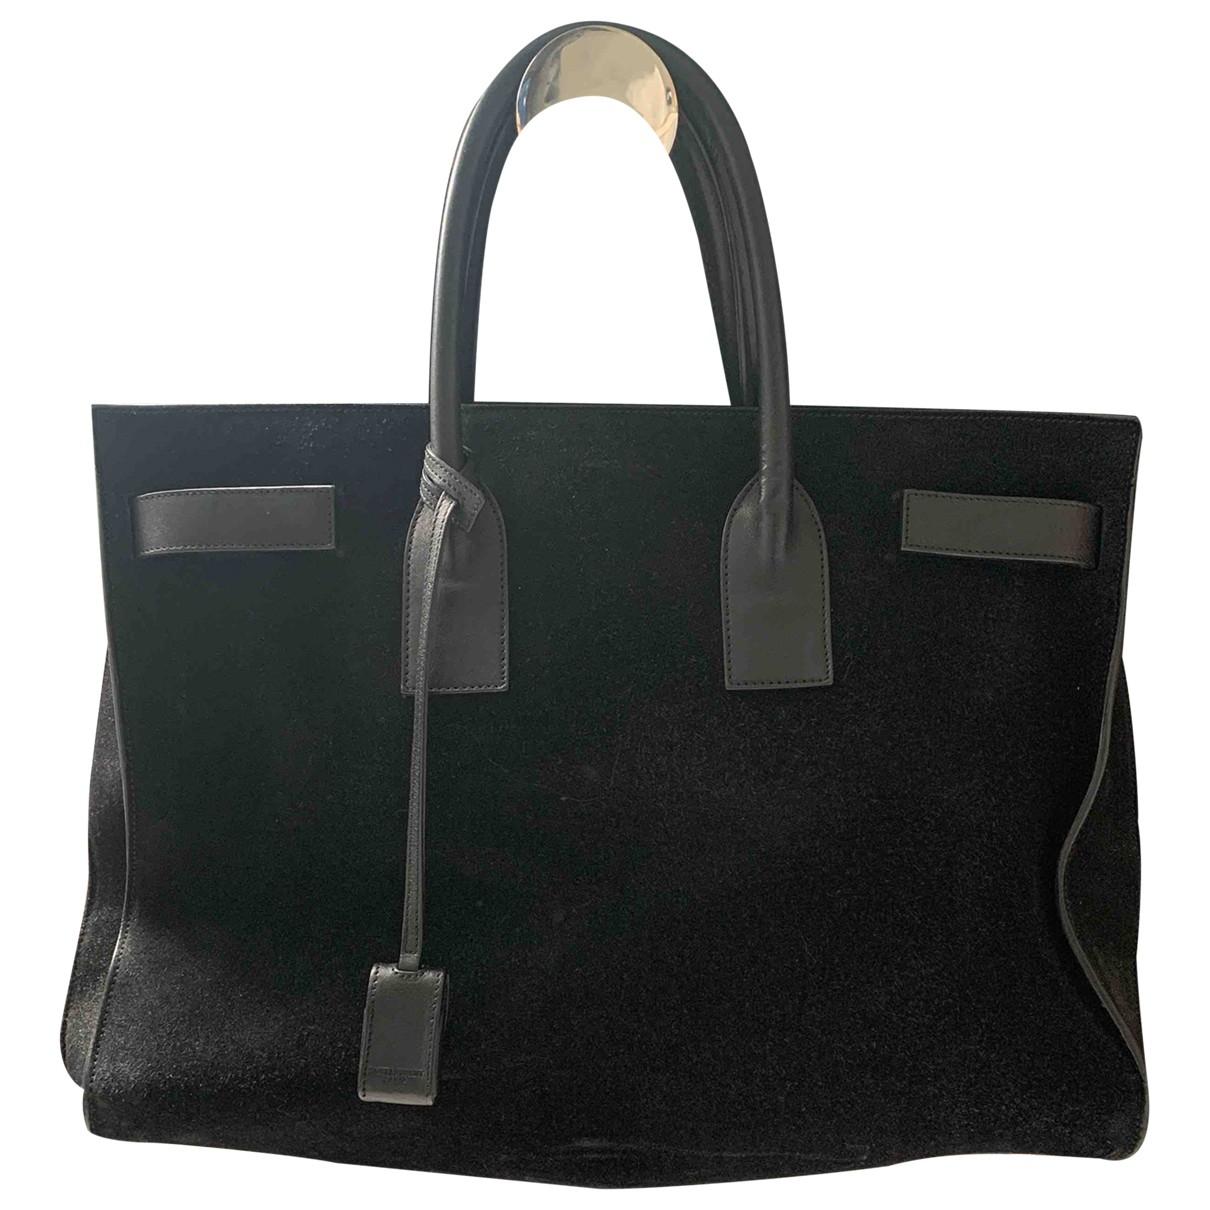 Saint Laurent Sac de Jour Black Suede handbag for Women \N